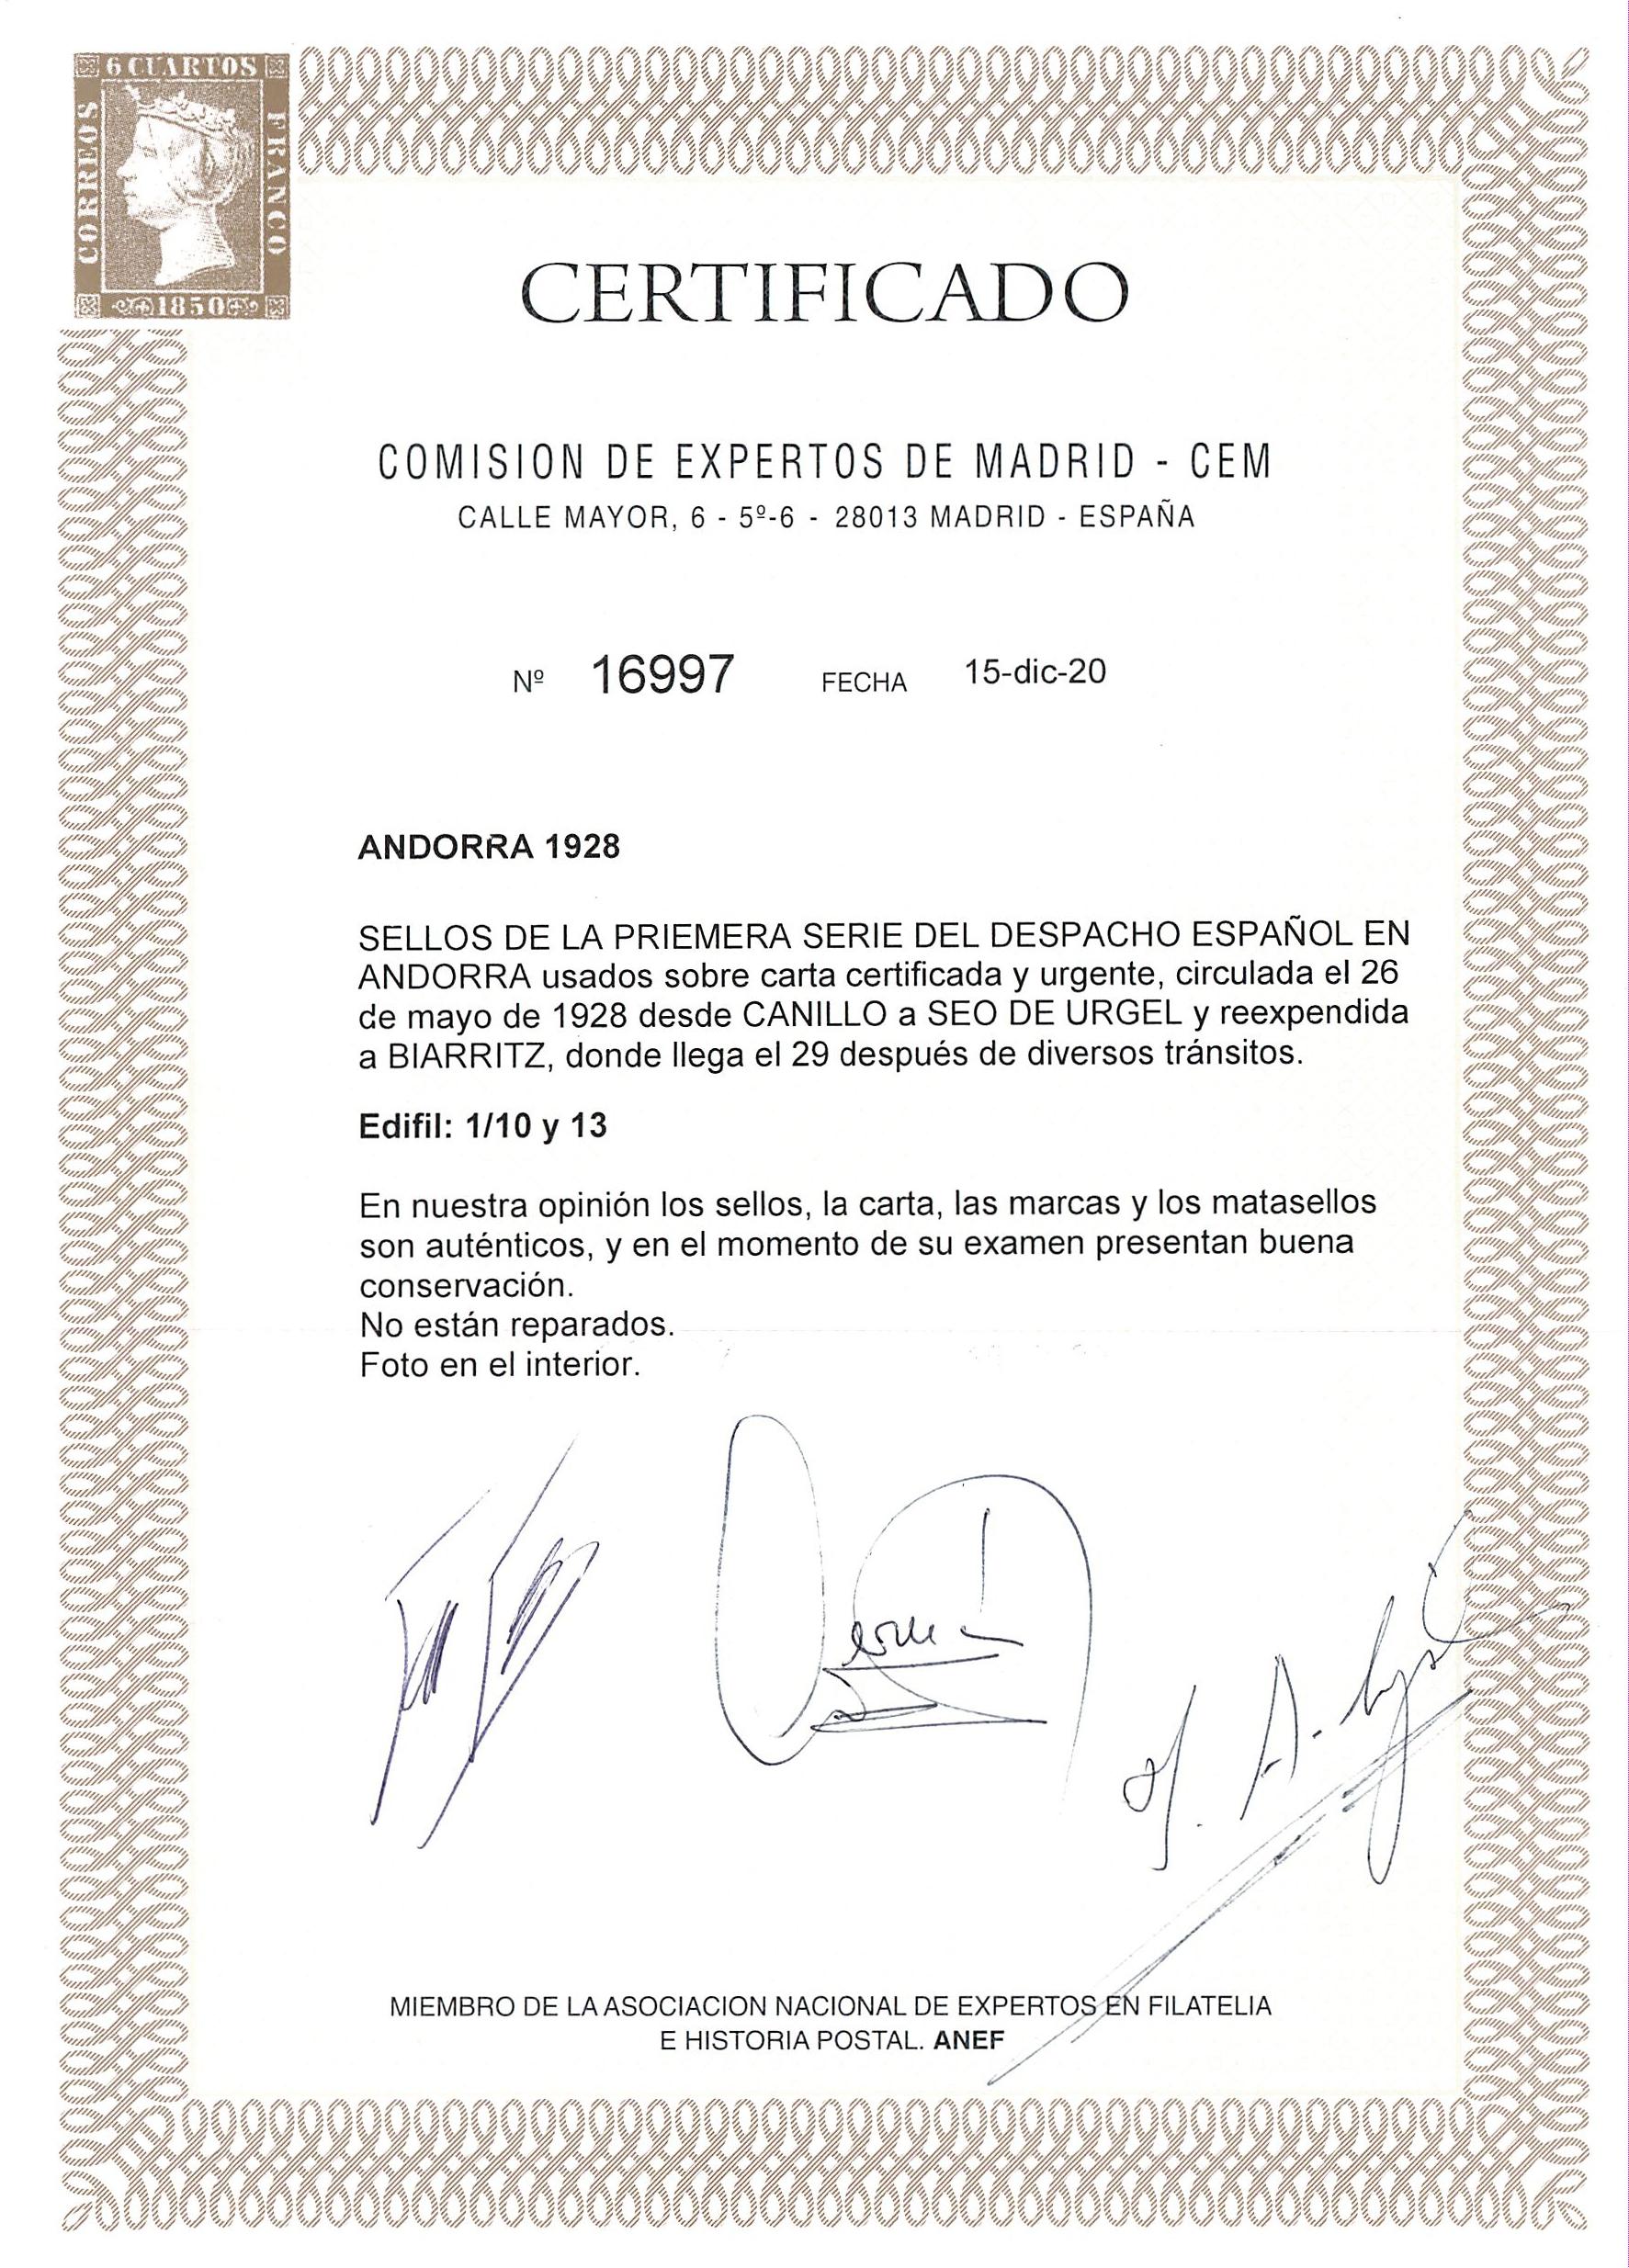 Lot 4 - europa Andorra -  Peter Harlos Auctions 42. Harlos Auktion